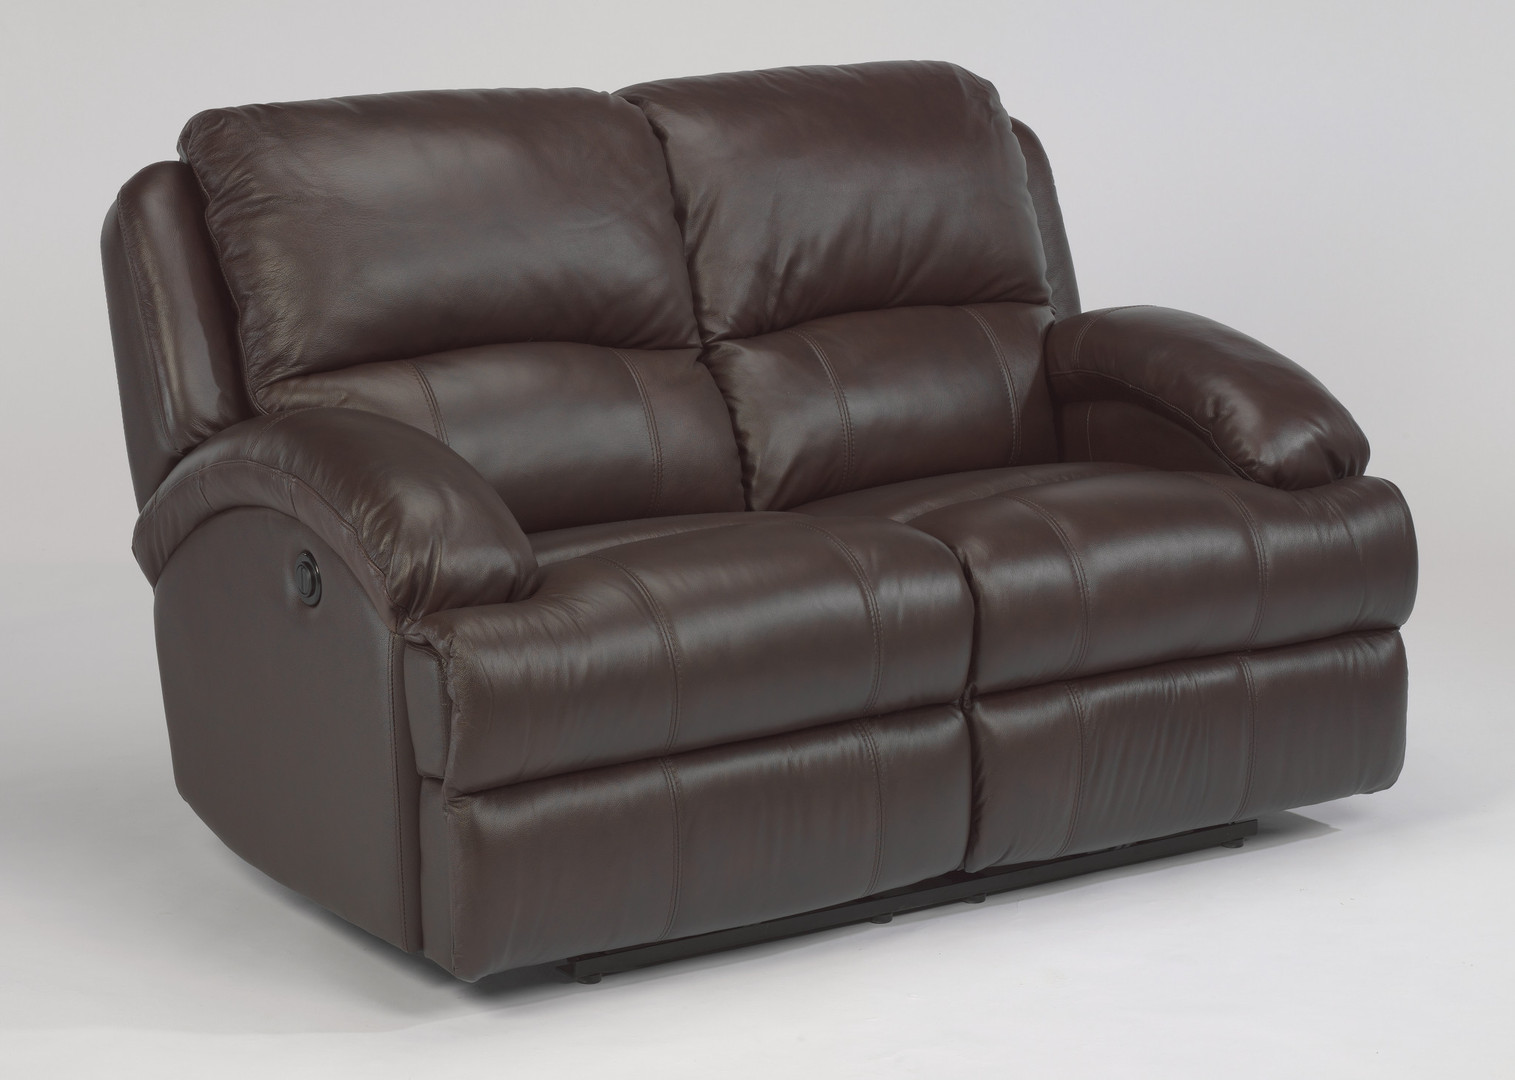 marlow reclining sofa loveseat and chair set caramel leather australia loveseats kelvington grey fabric